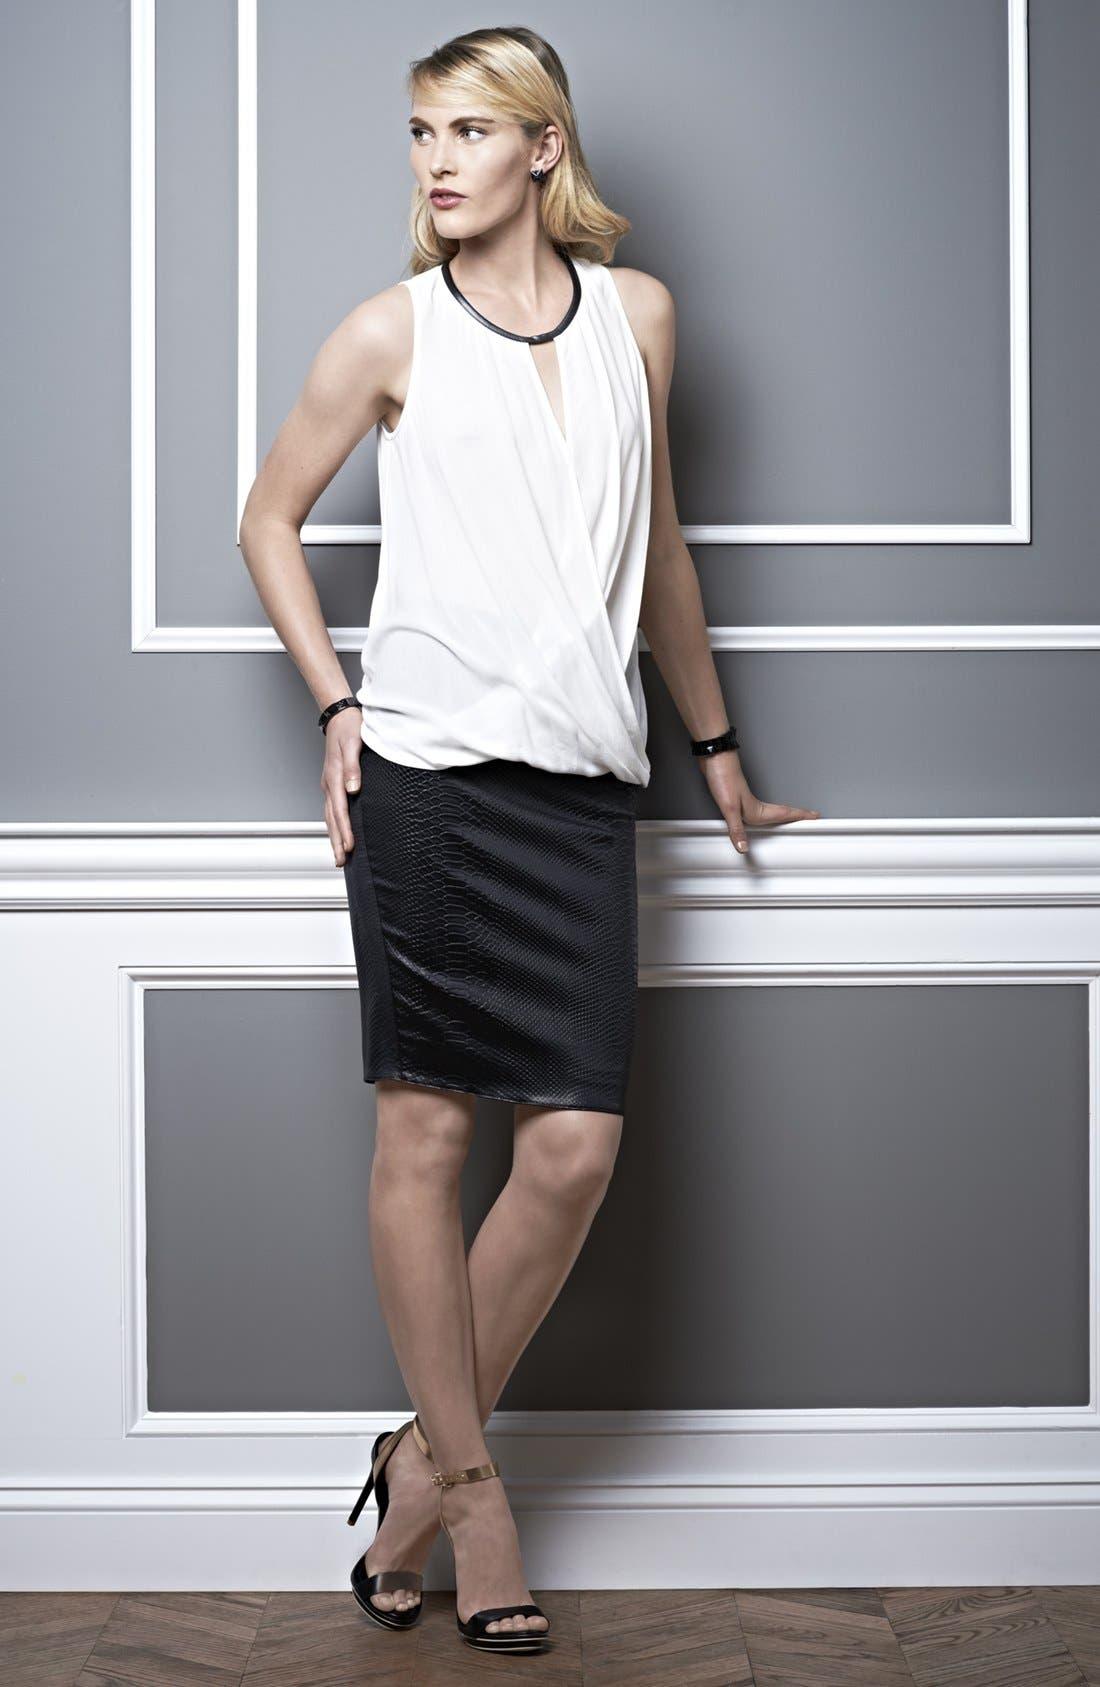 Alternate Image 1 Selected - Ella Moss Tank & Bailey 44 Skirt